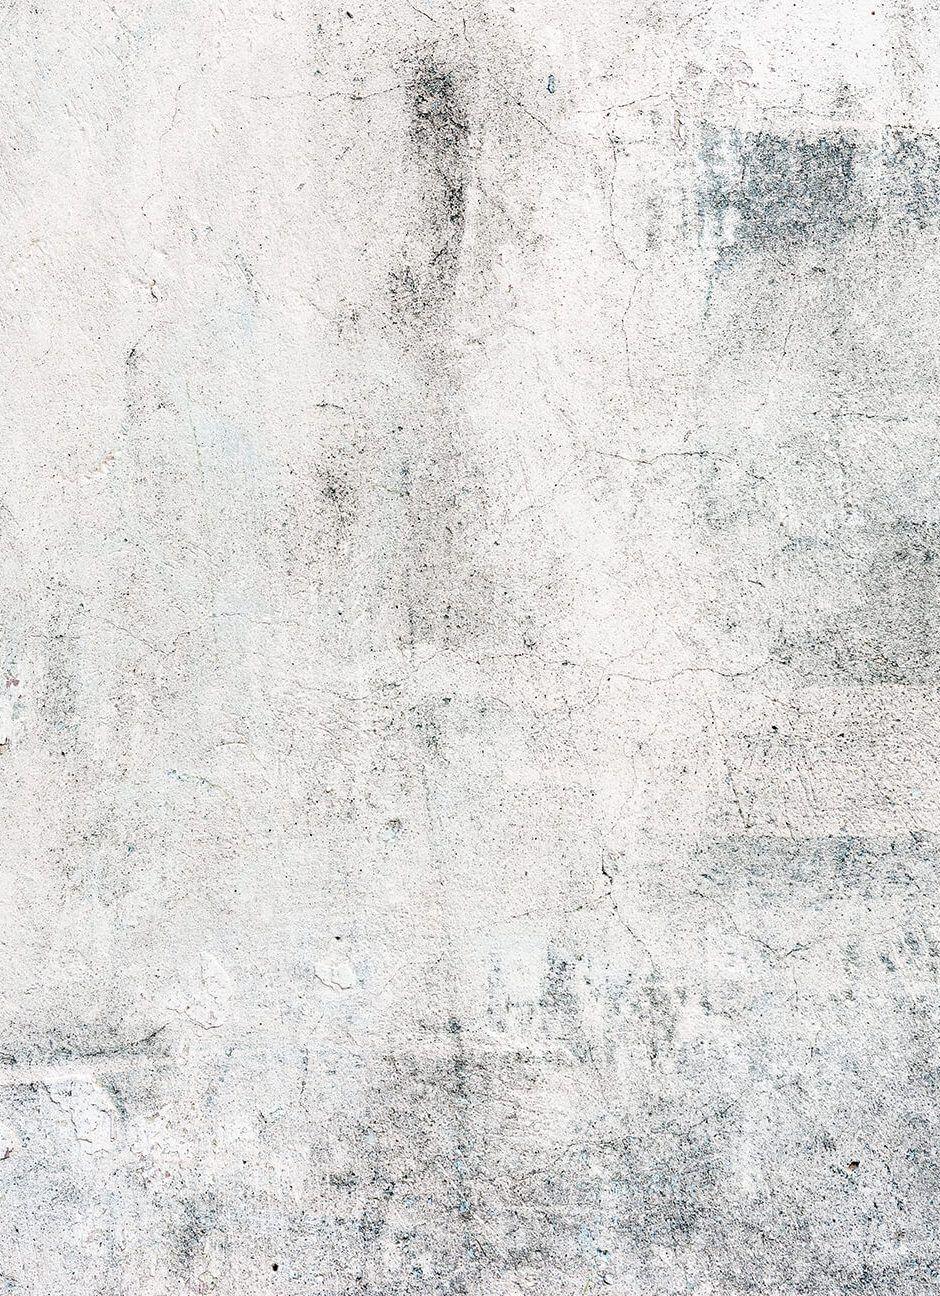 Rough Plaster Wall Mural Milexa Plaster Walls Plaster Texture Concrete Texture